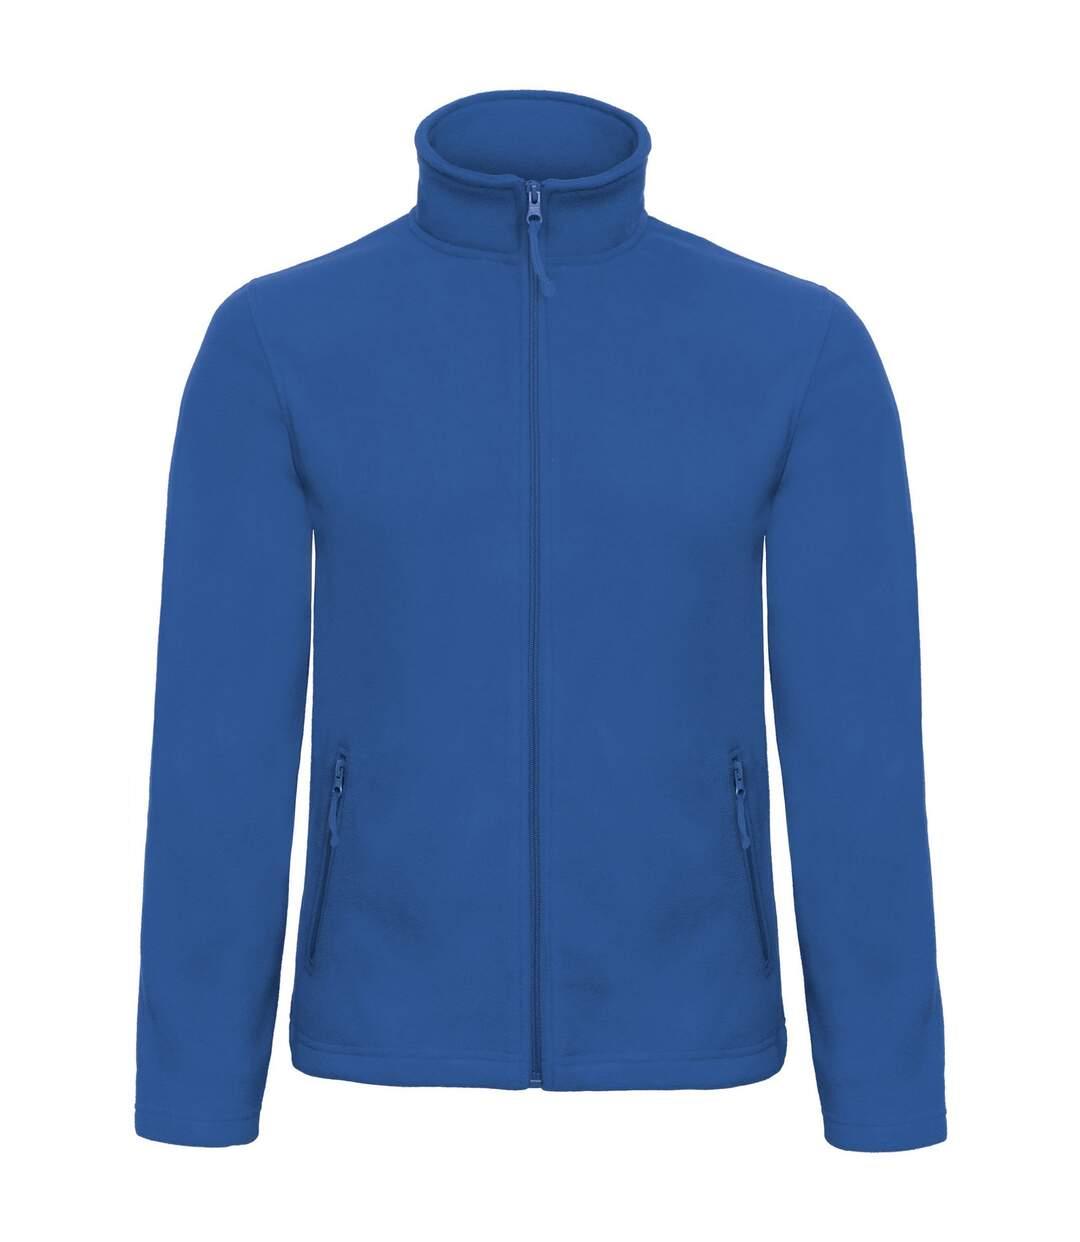 B&C Collection Mens ID 501 Microfleece Jacket (White) - UTRW3527